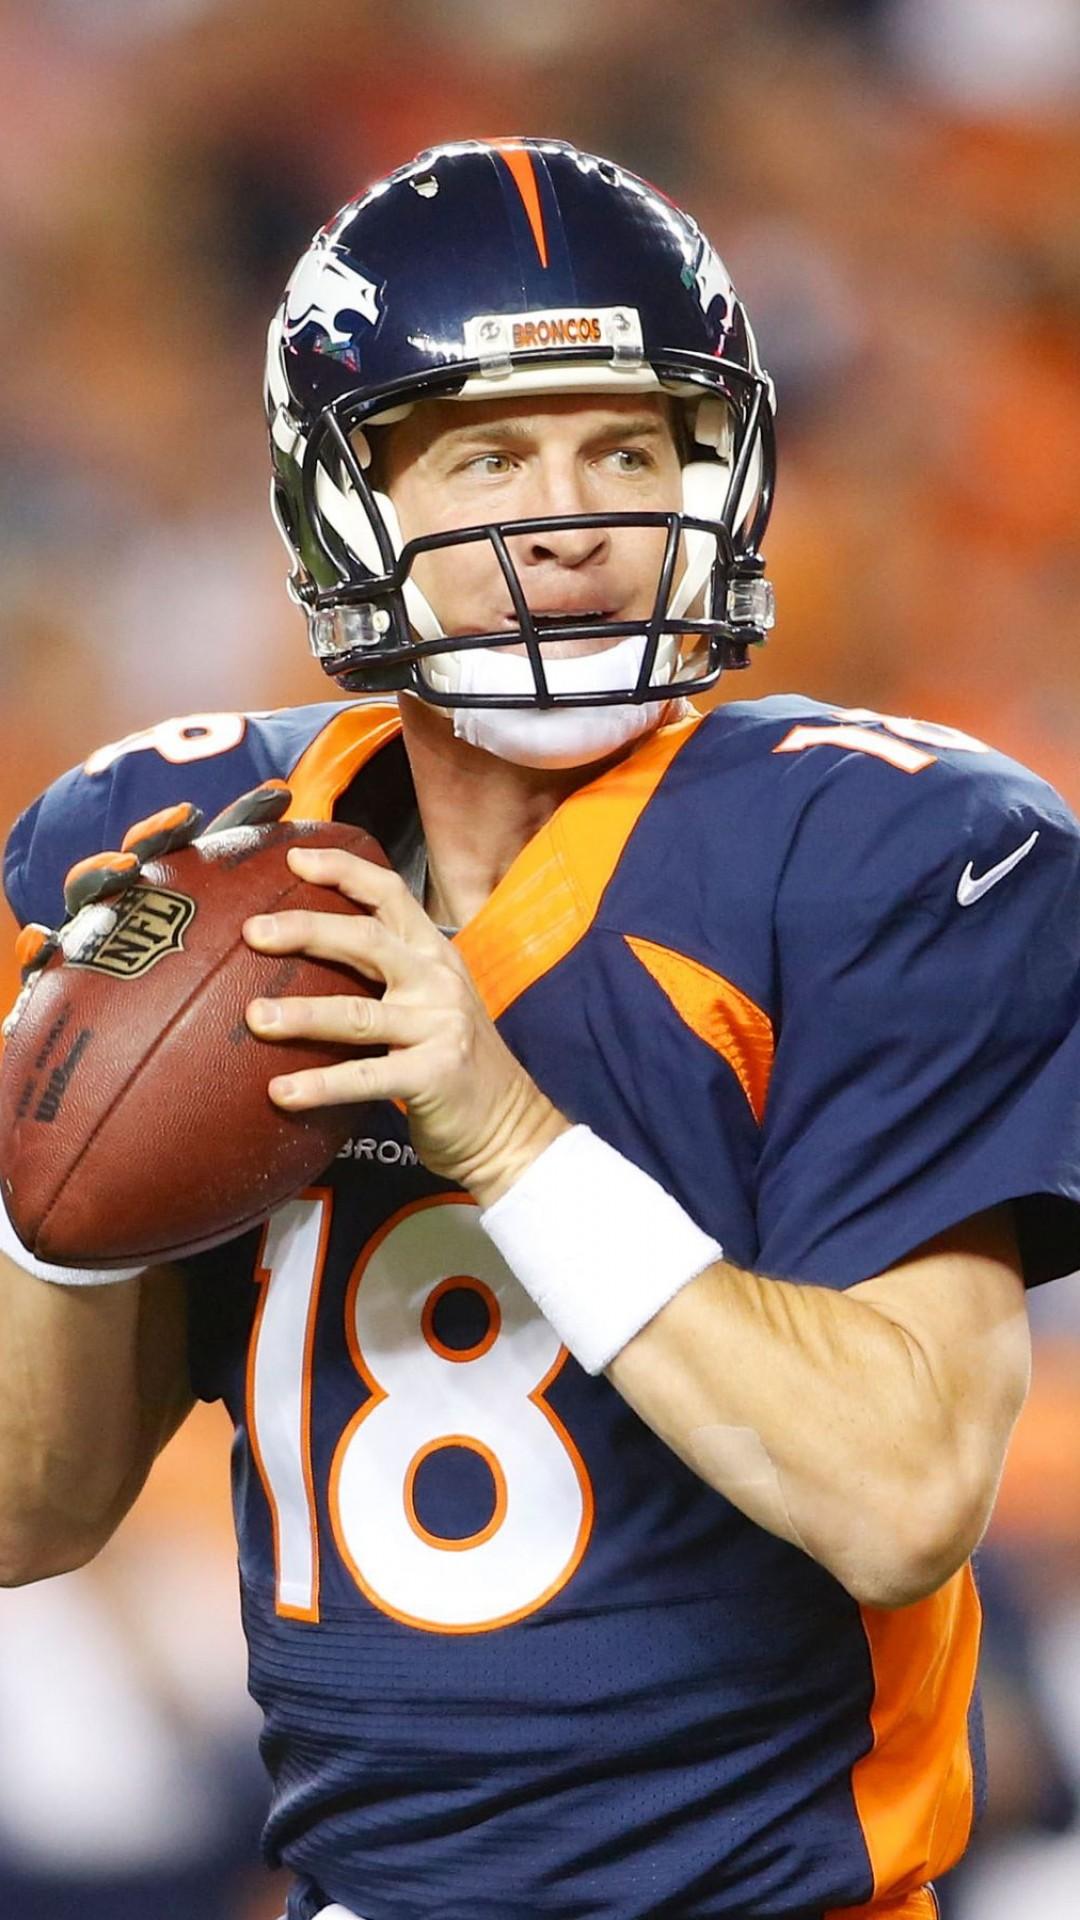 Denver Broncos iPhone 5 Wallpaper HD.